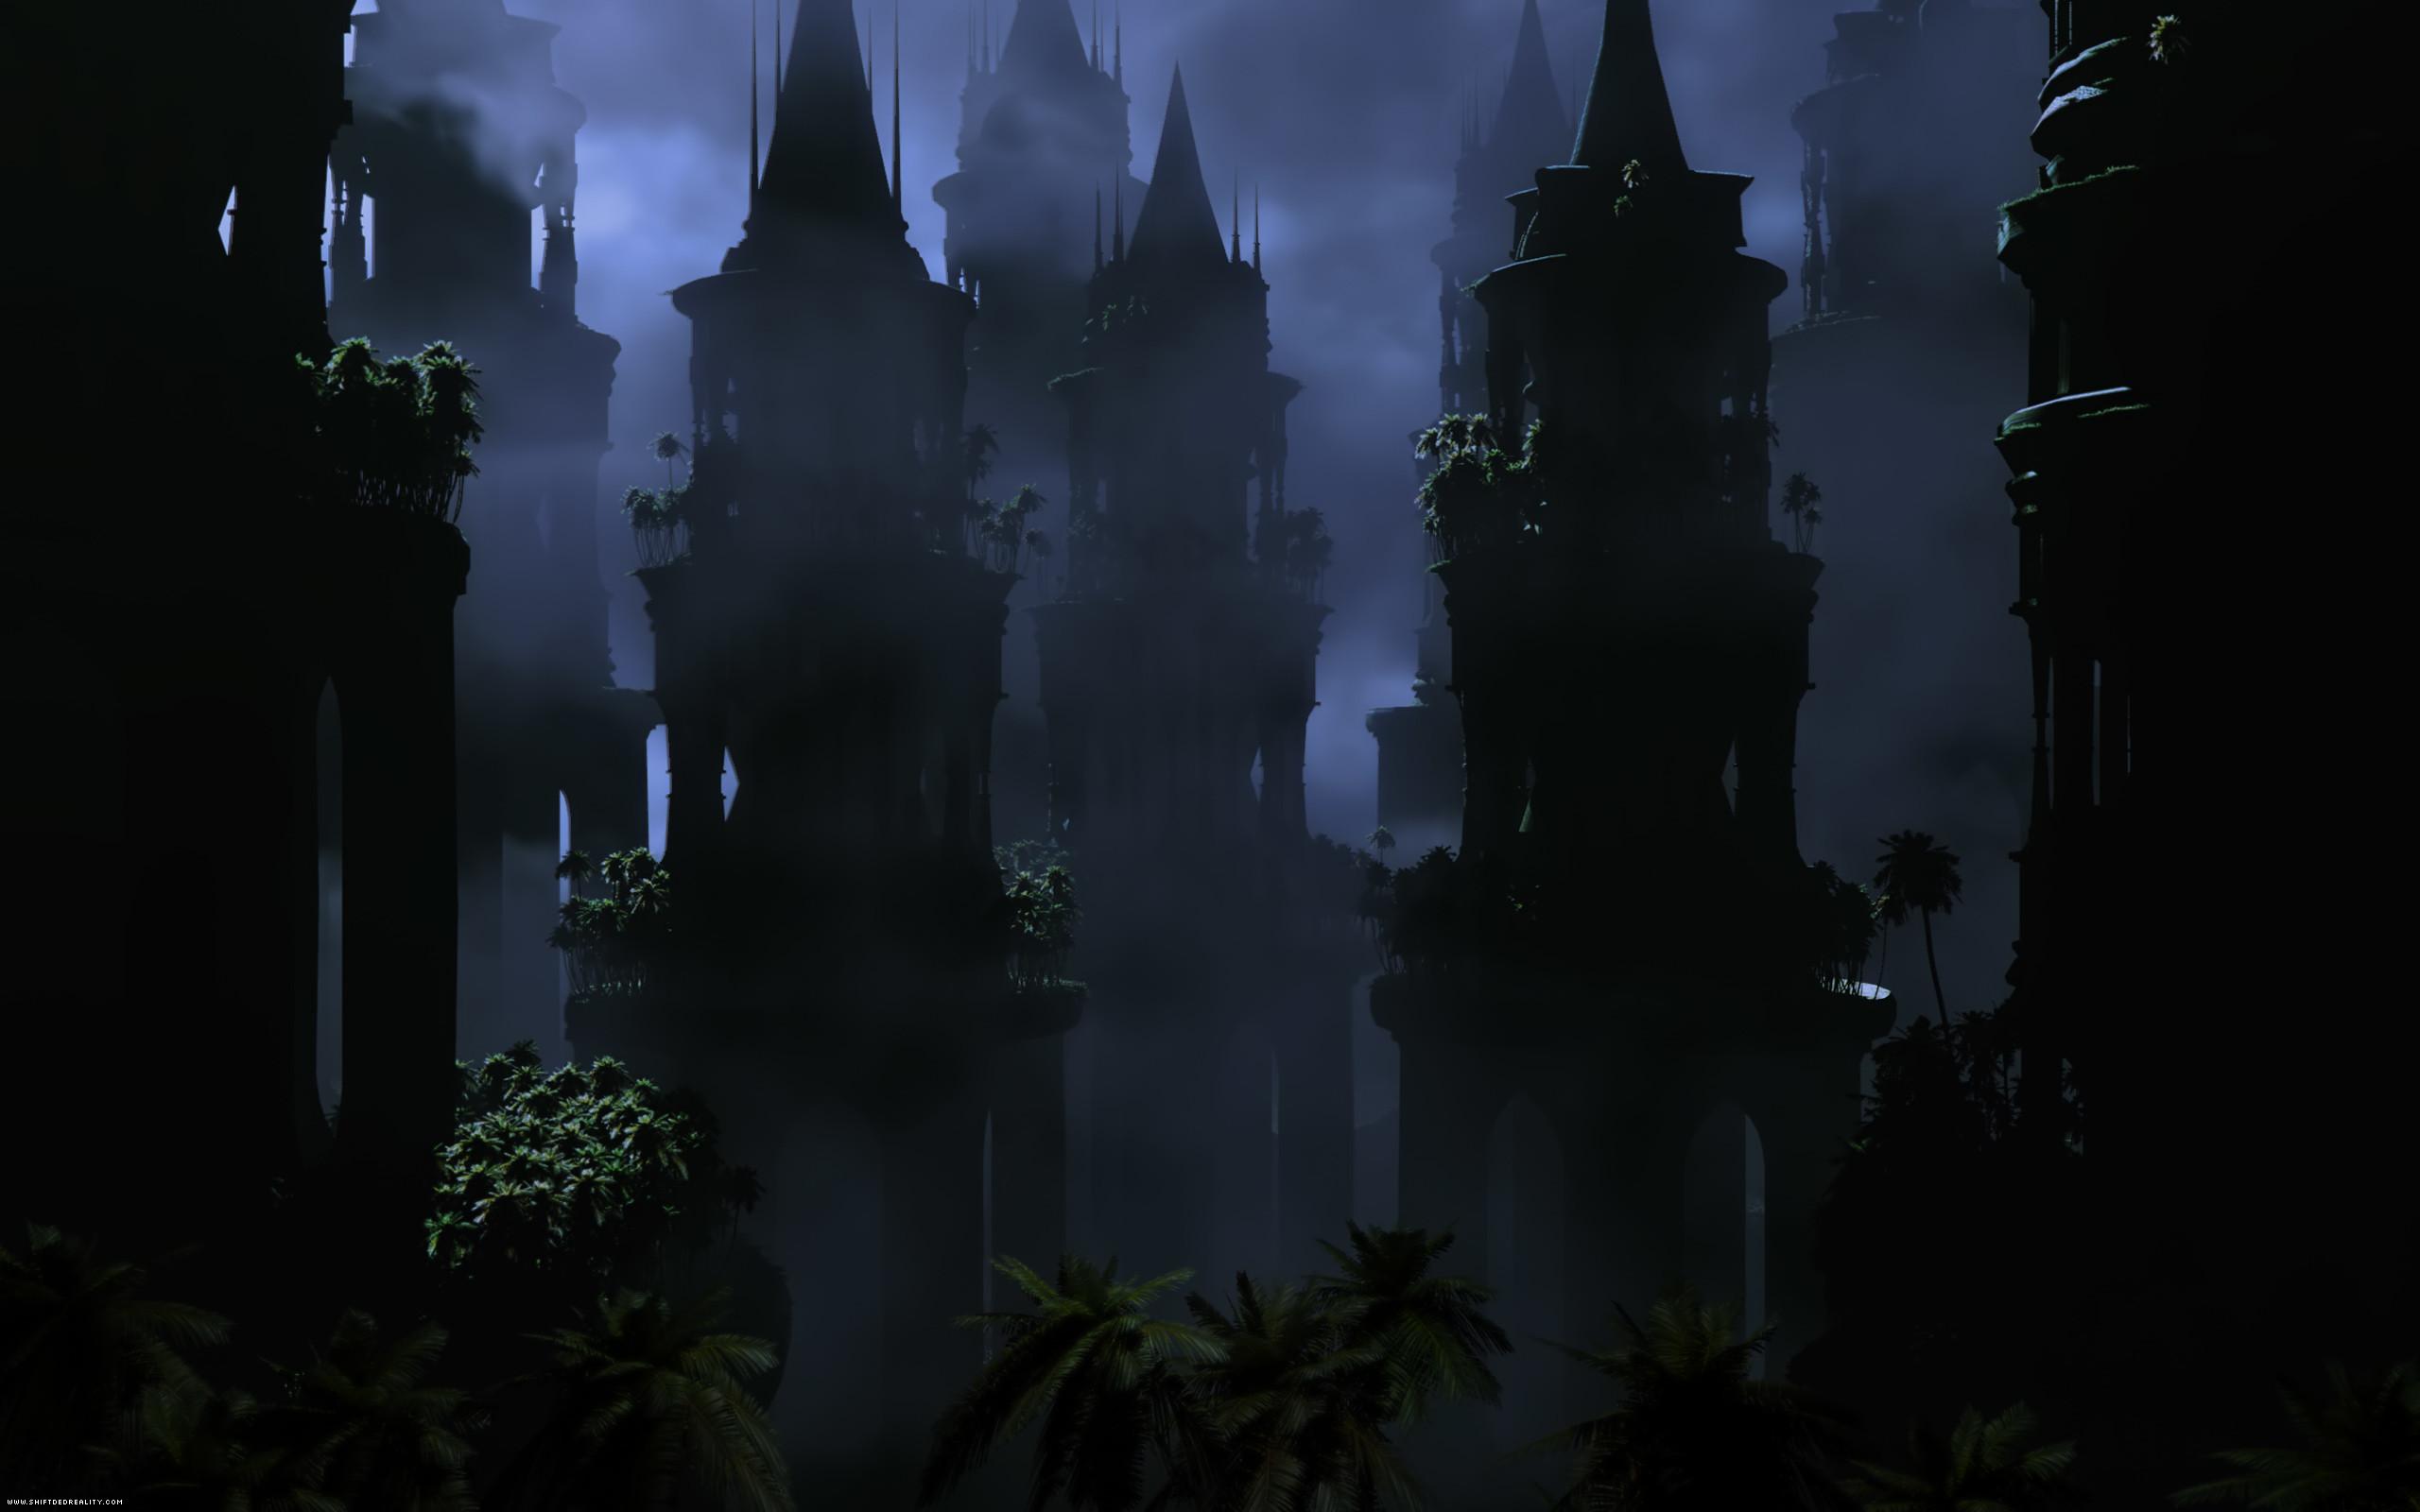 Dark Gothic Photo Gallery | … under: 3D Wallpaper by admin | Social